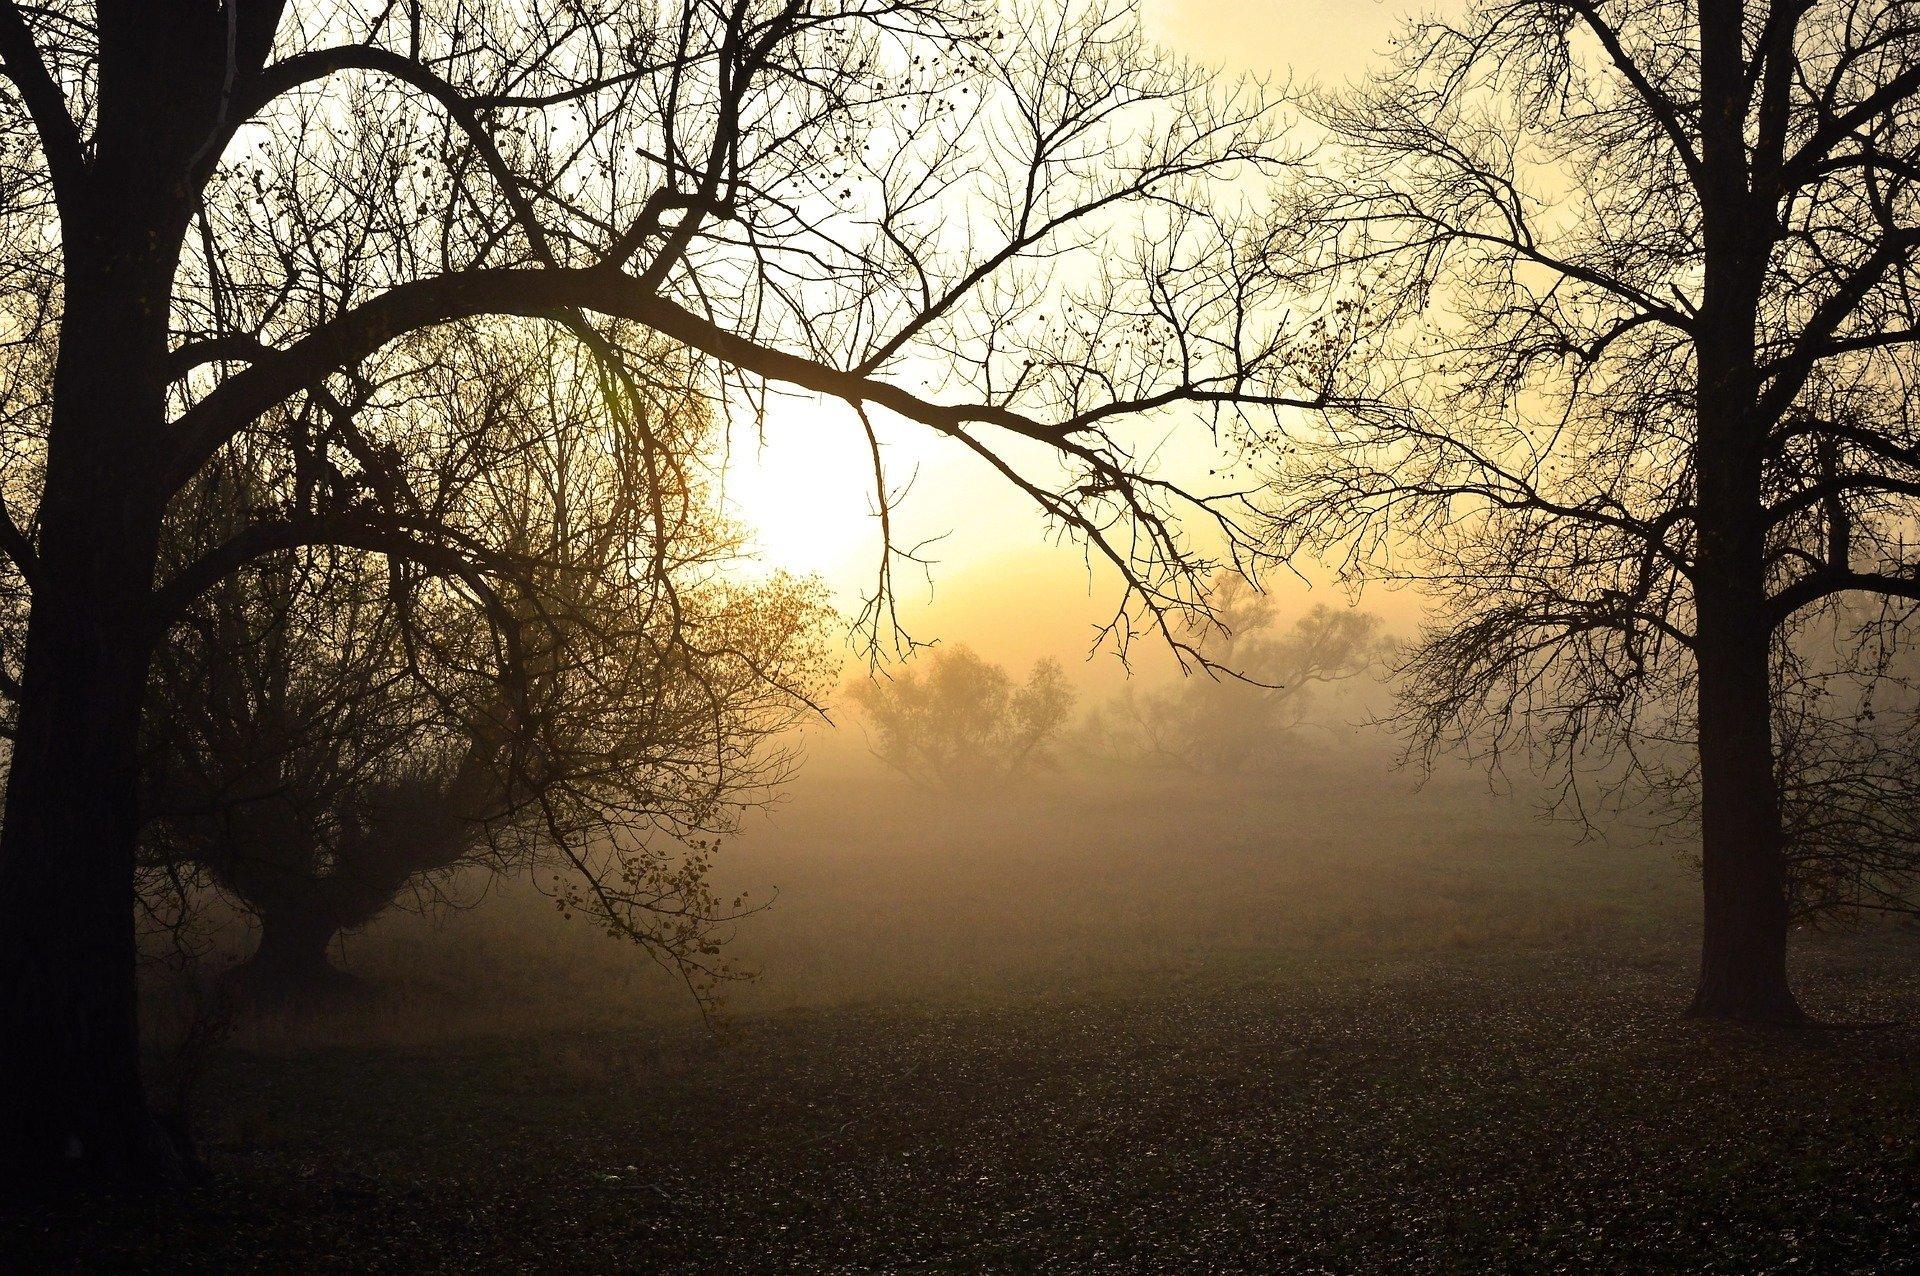 Herbstwetter nebel Peggychoucair Pixabay